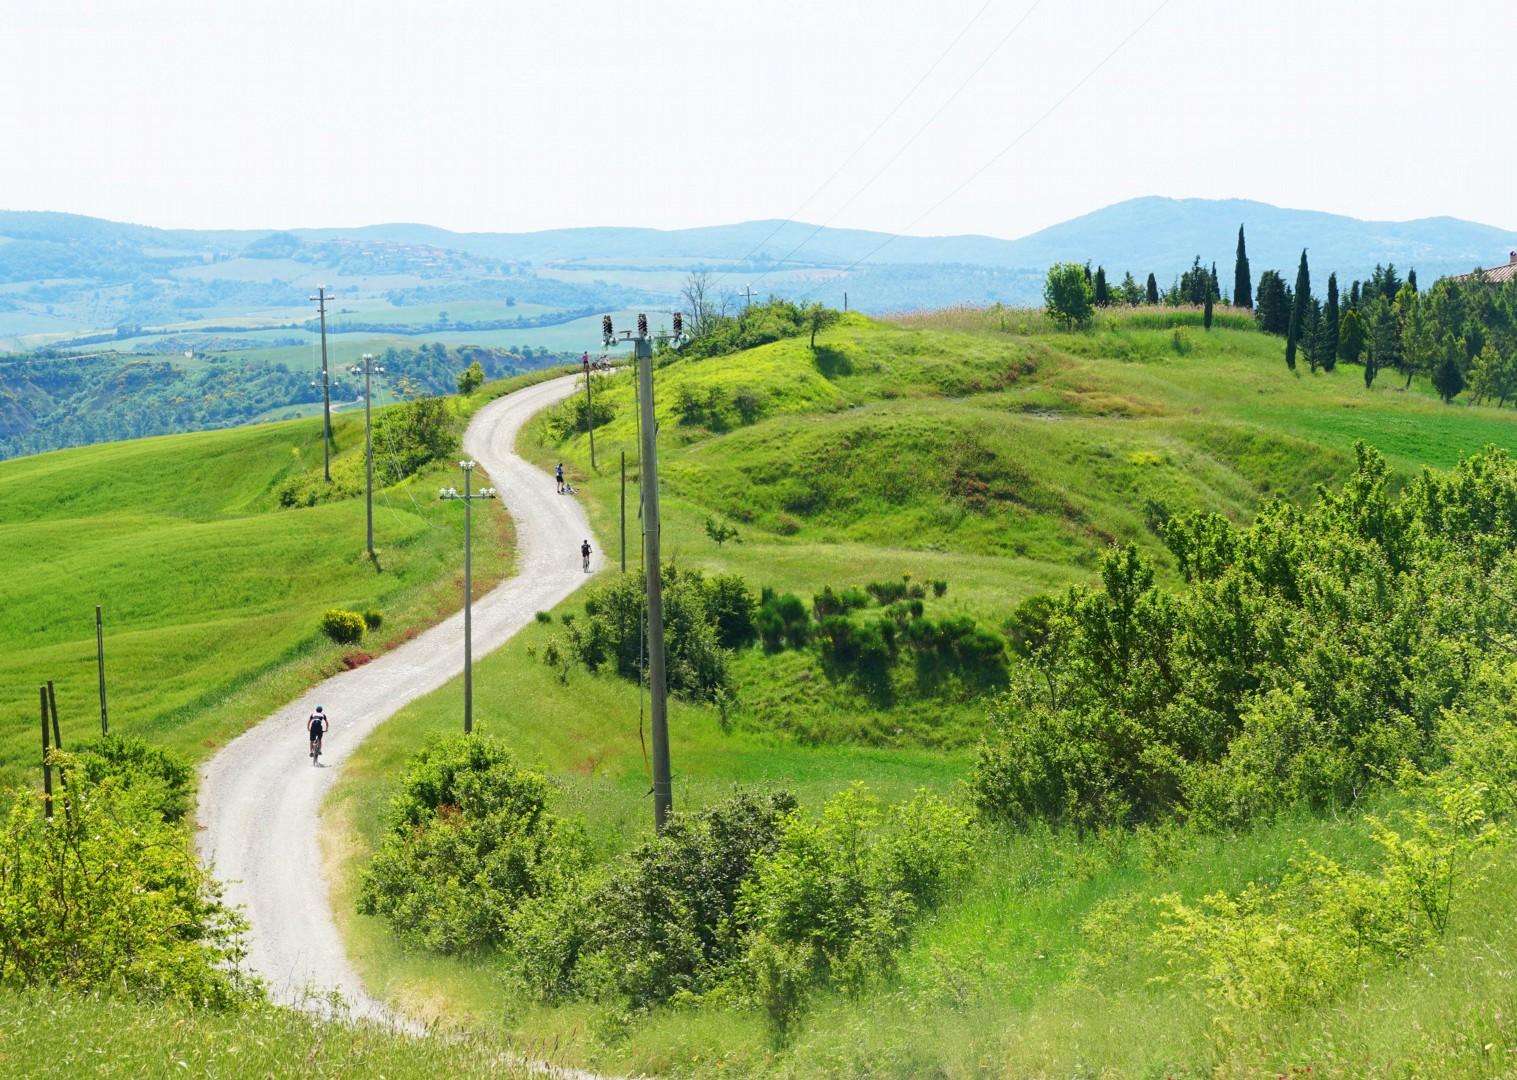 mountain-bike-trip-via-francigena-tuscany-to-rome-self-guided.jpg - Italy - Via Francigena (Tuscany to Rome) - Self-Guided Mountain Bike Holiday - Mountain Biking